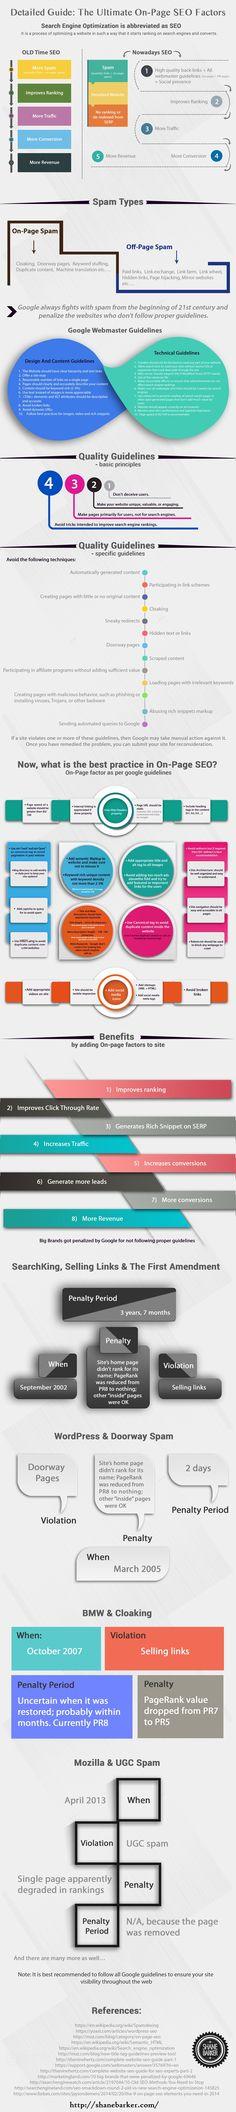 Best on page seo tactics 2015 [infographic] Inbound Marketing, Online Marketing, Digital Marketing, Content Marketing, Media Marketing, Seo Guide, Seo Tips, Onpage Seo, Seo Consultant